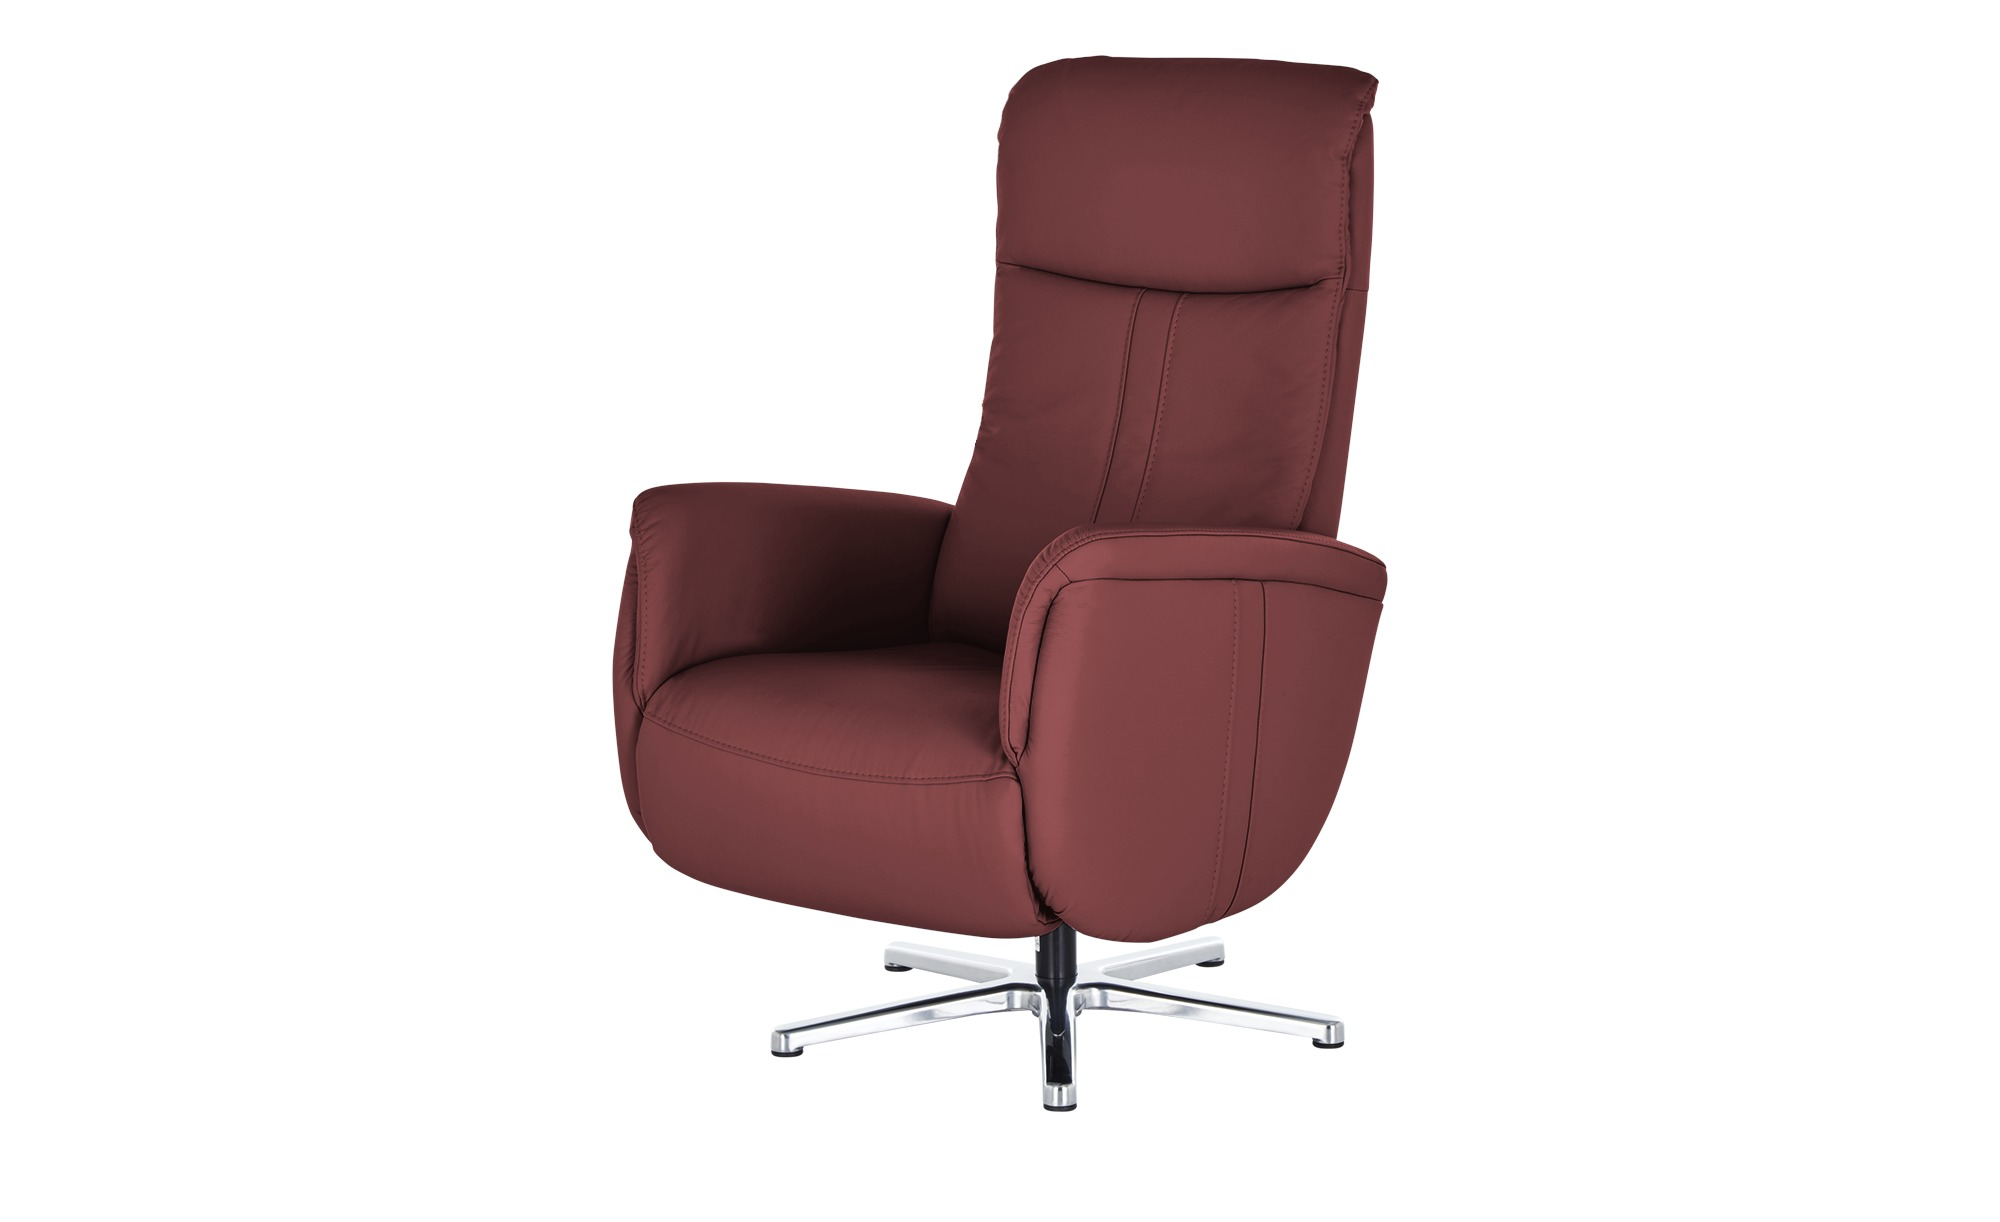 meinSofa Relaxsessel  Franzi-L ¦ rot ¦ Maße (cm): B: 71 H: 112 T: 83 Polstermöbel > Sessel > Fernsehsessel - Höffner | Wohnzimmer > Sessel > Relaxsessel | Rot | Leder | Möbel Höffner DE